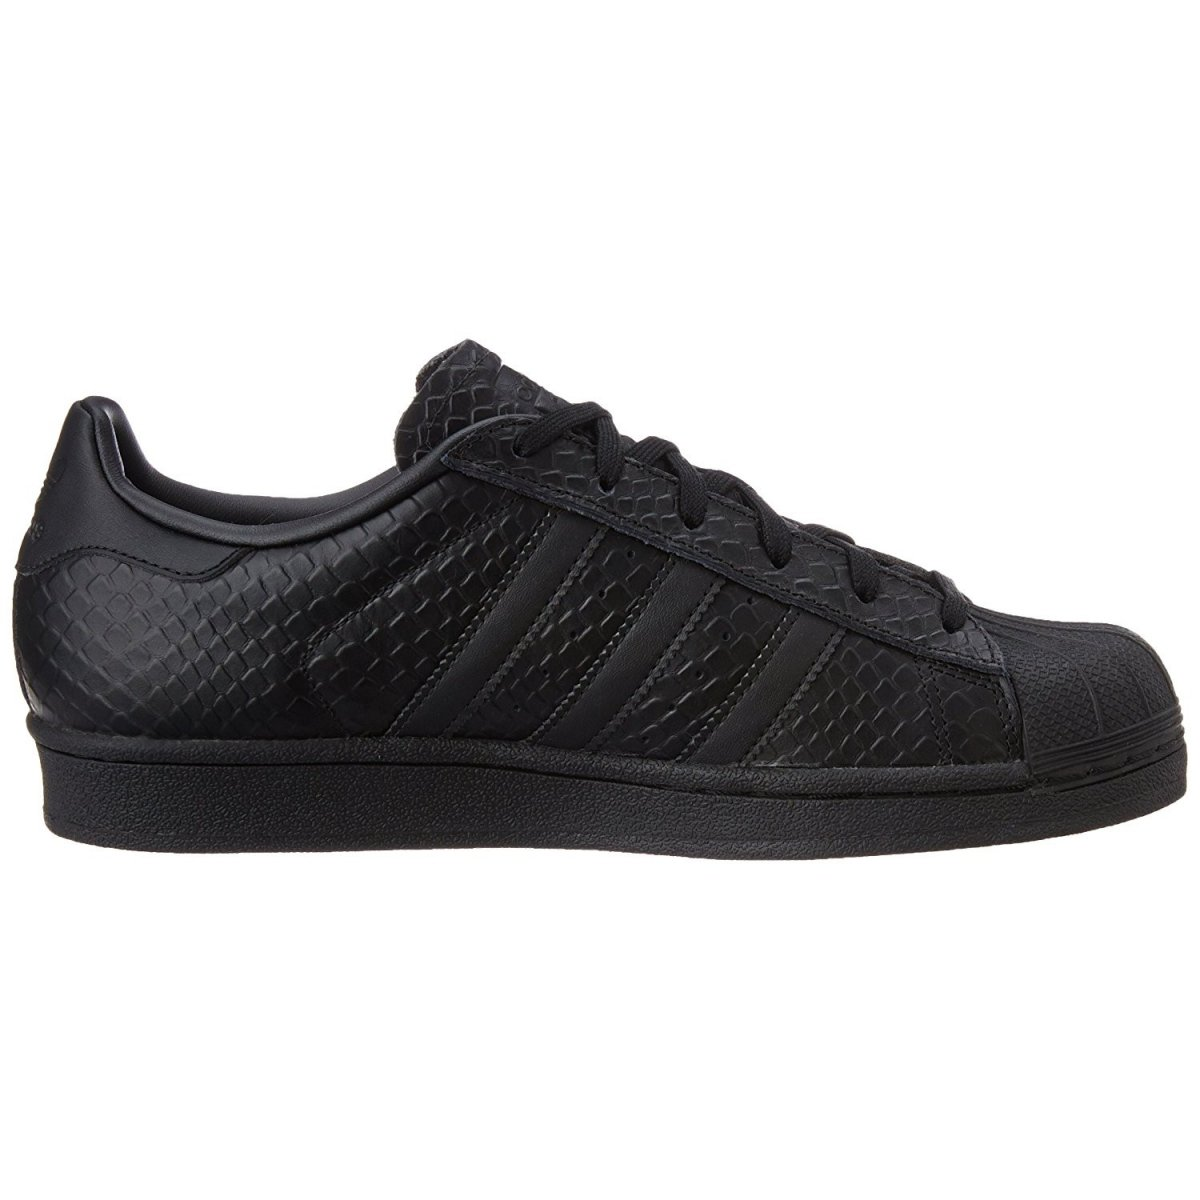 6842e8e6a4294 W Originals S76147 Buty Adidas Superstar tPw0Tgq